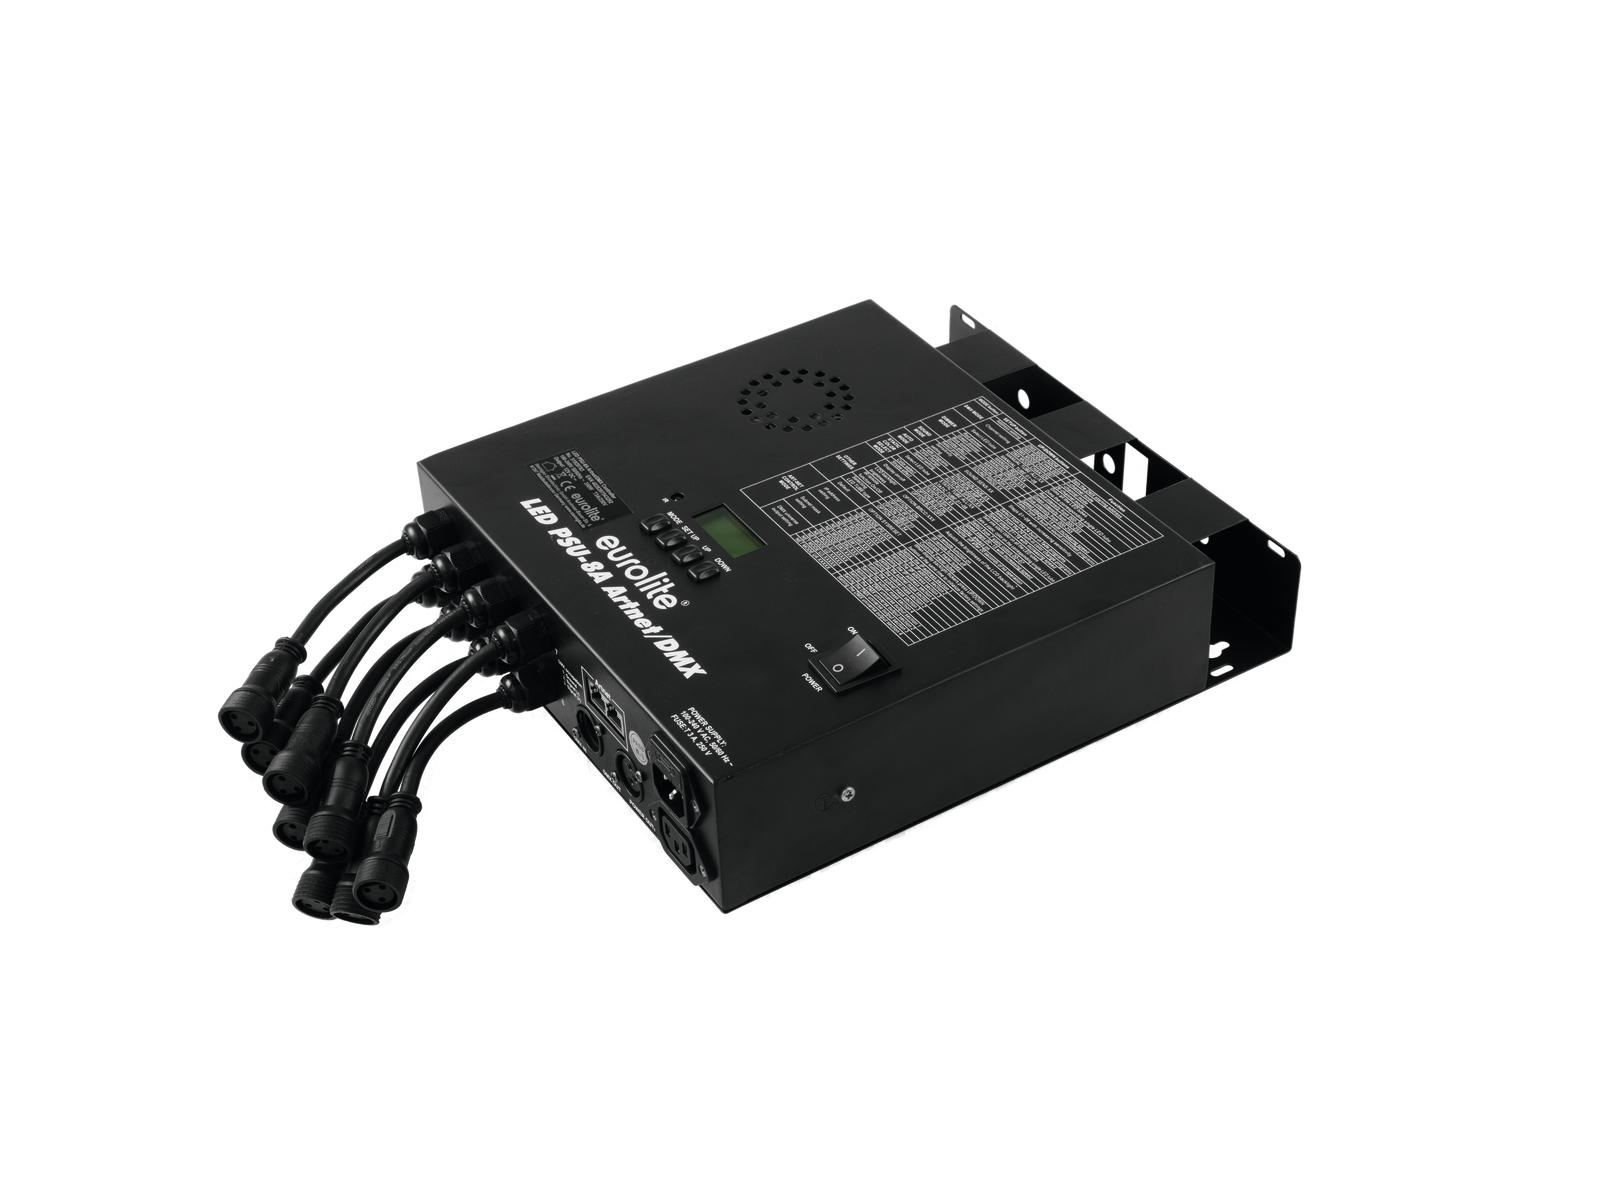 EUROLITE LED PSU-8A Artnet/DMX